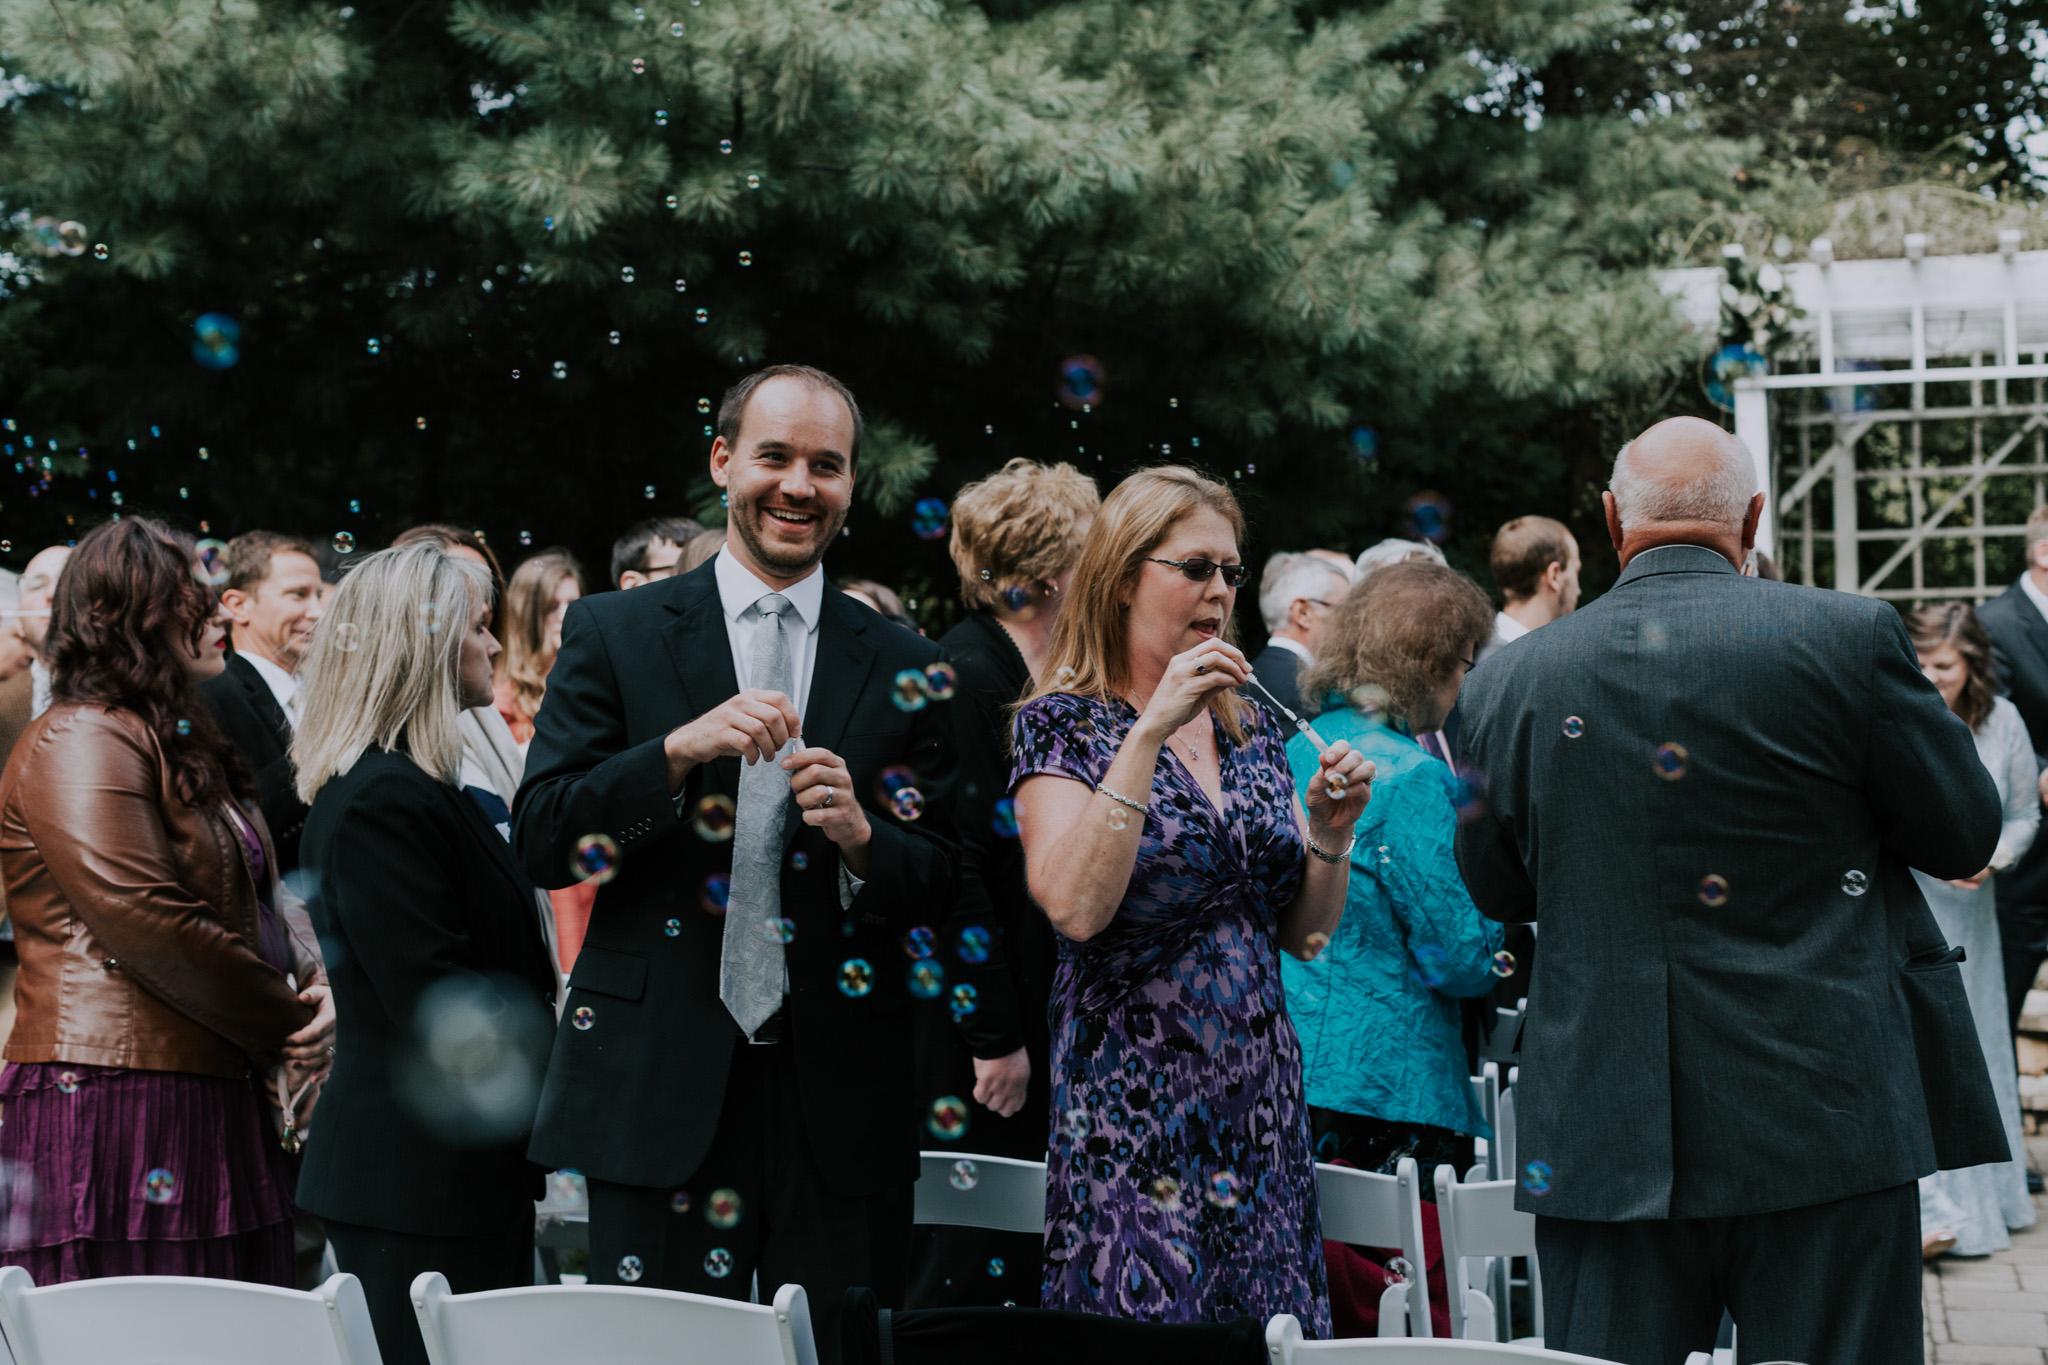 MillCreek-Wilde-Wedding-Barn-Michigan-Eliza-Eric-Vafa-Photo694.jpg